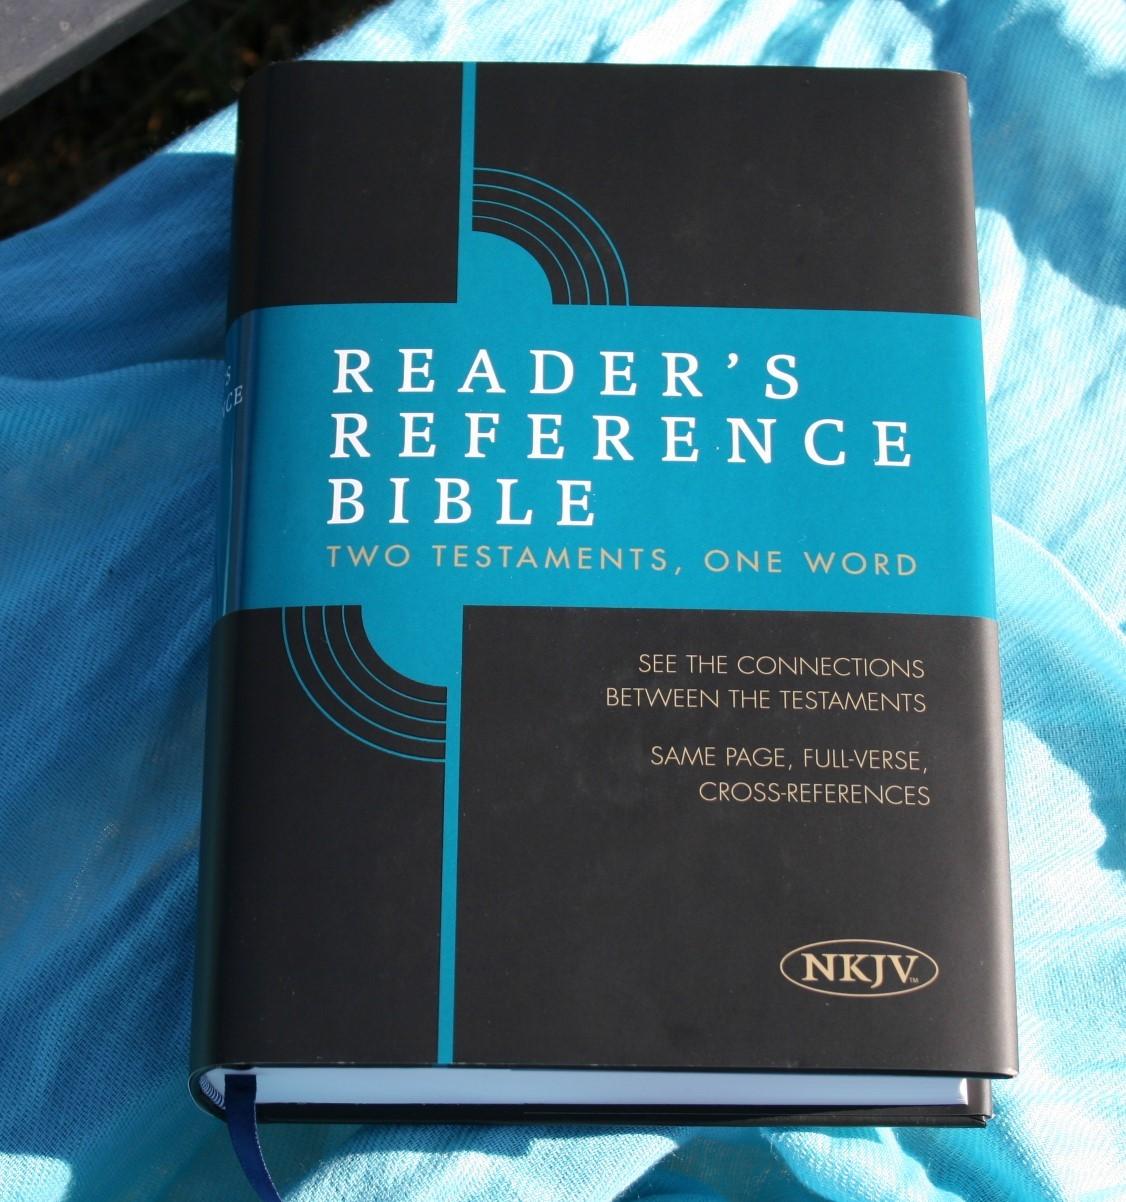 Bible Study Reference: Holman NKJV Reader's Reference Bible